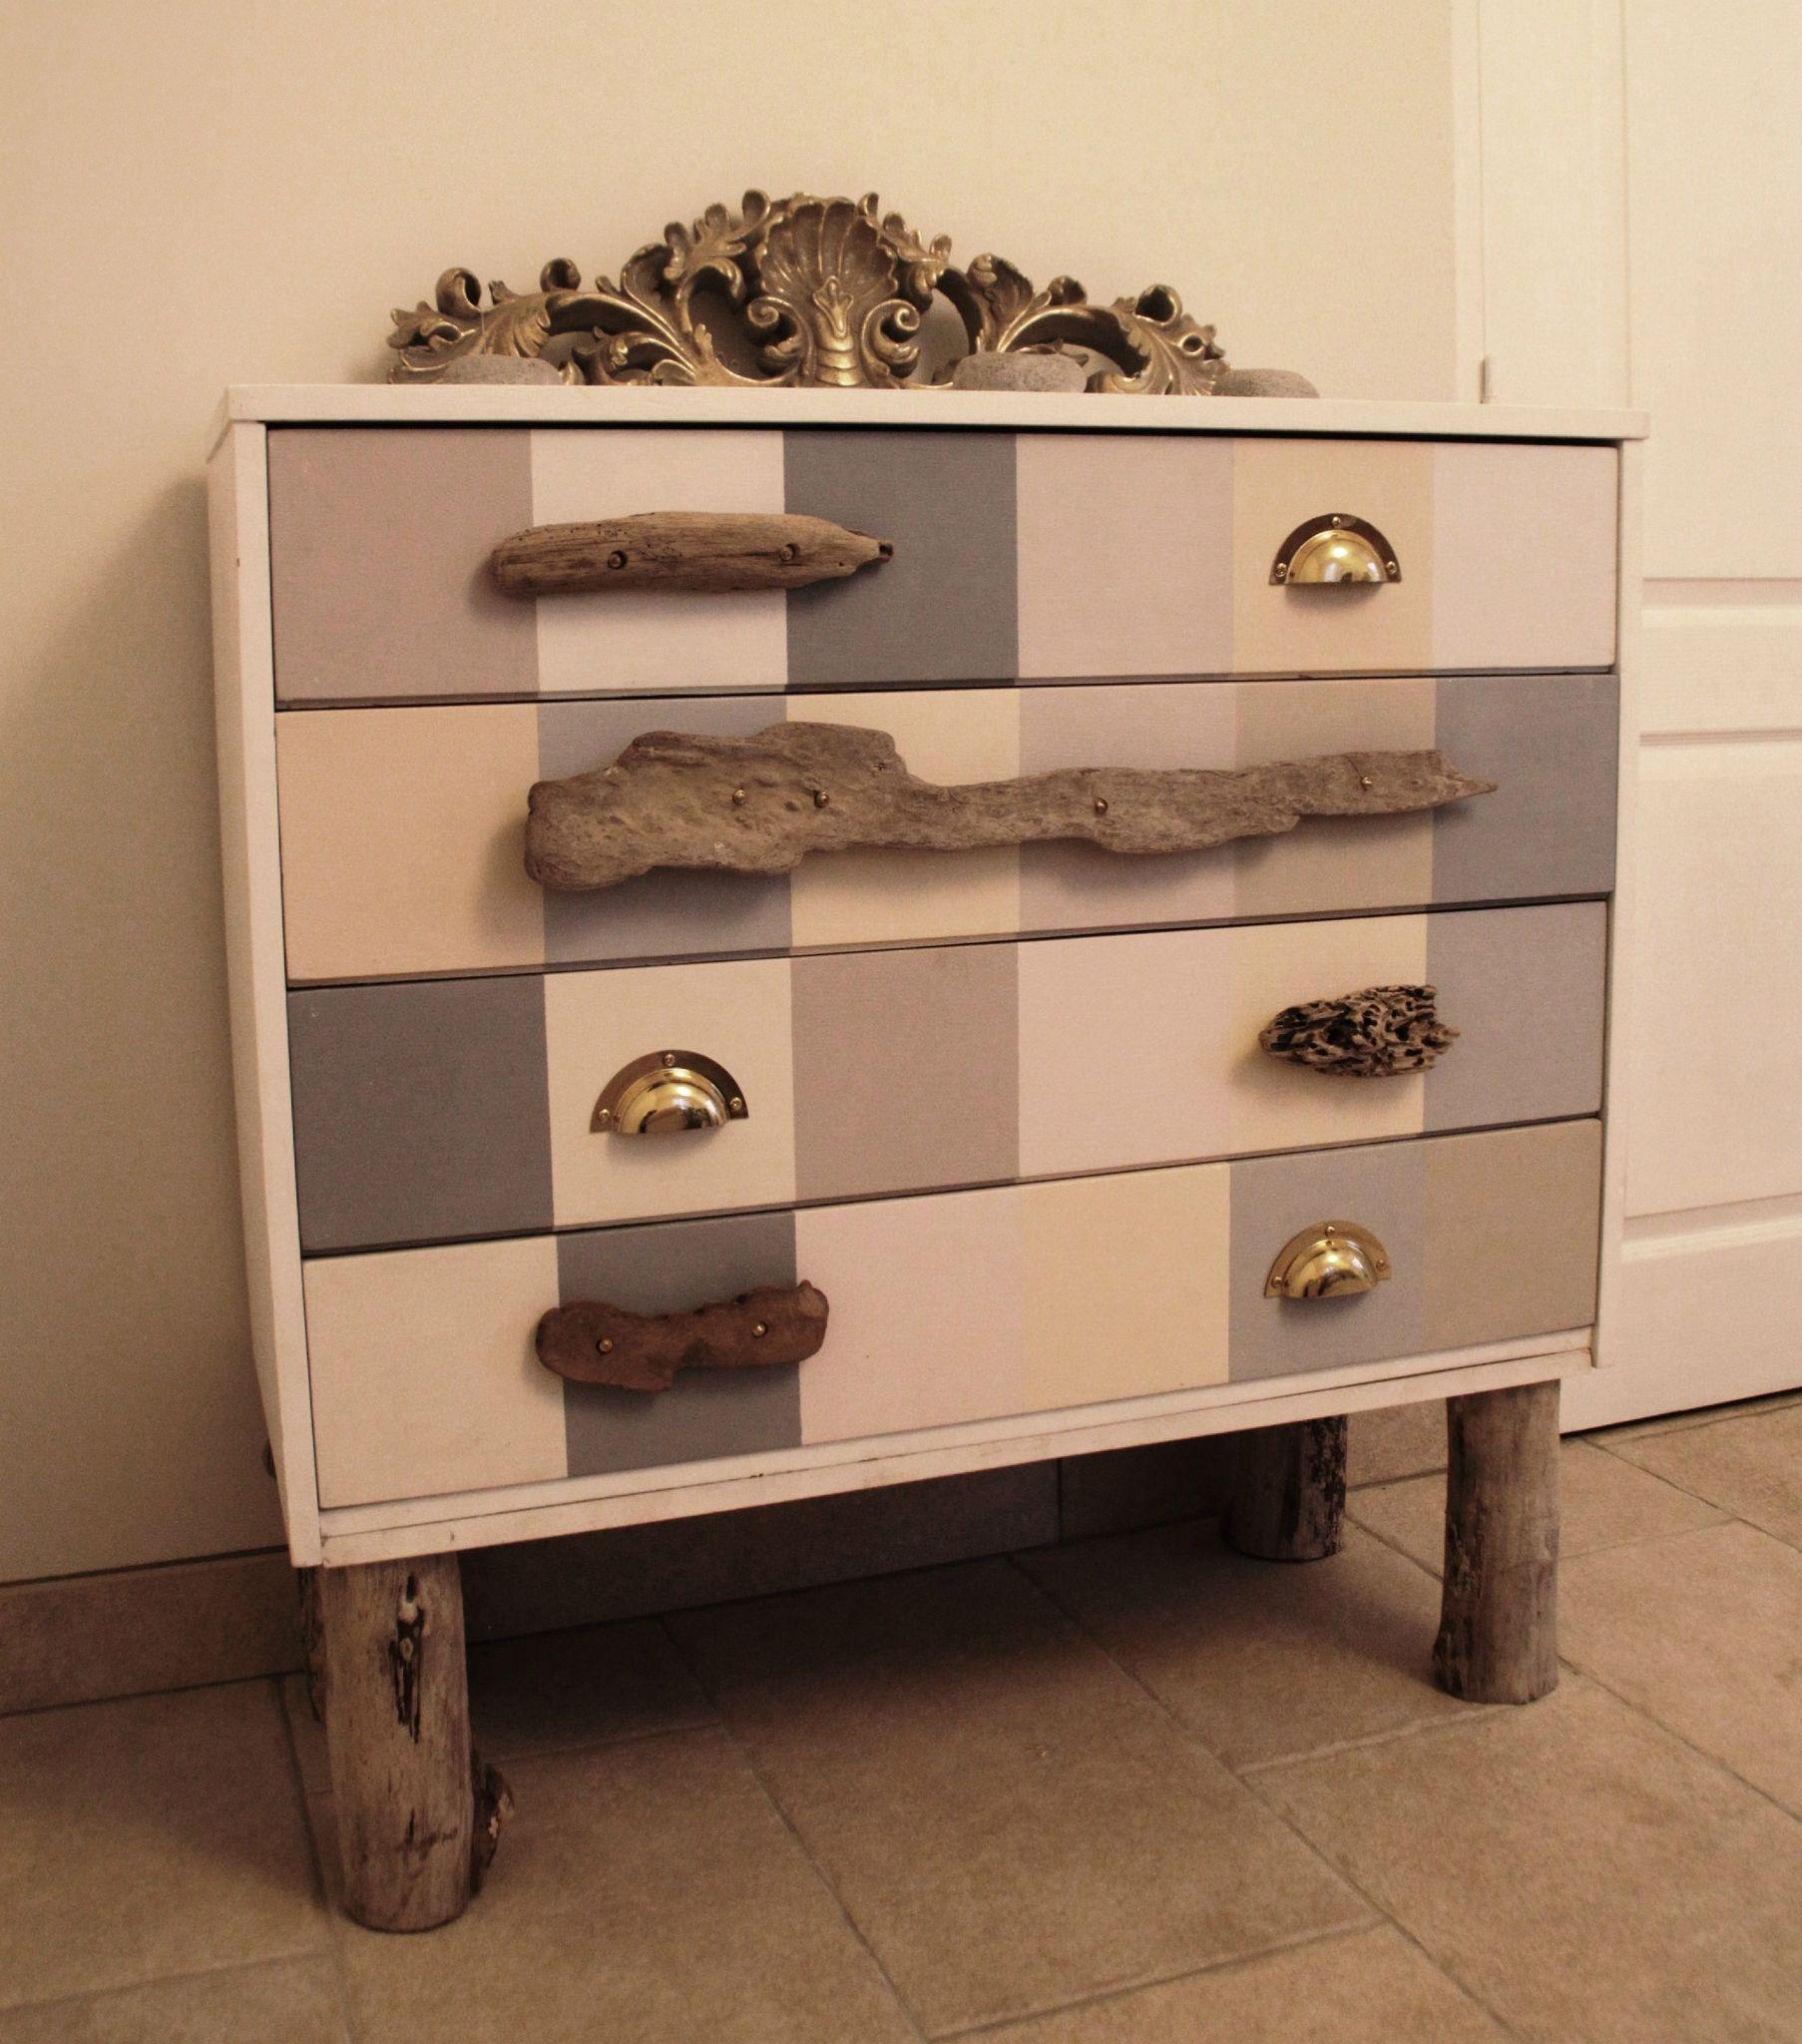 transformer une commode dans l 39 esprit bord de mer chic diy relooking mobilier cr er ma d co. Black Bedroom Furniture Sets. Home Design Ideas